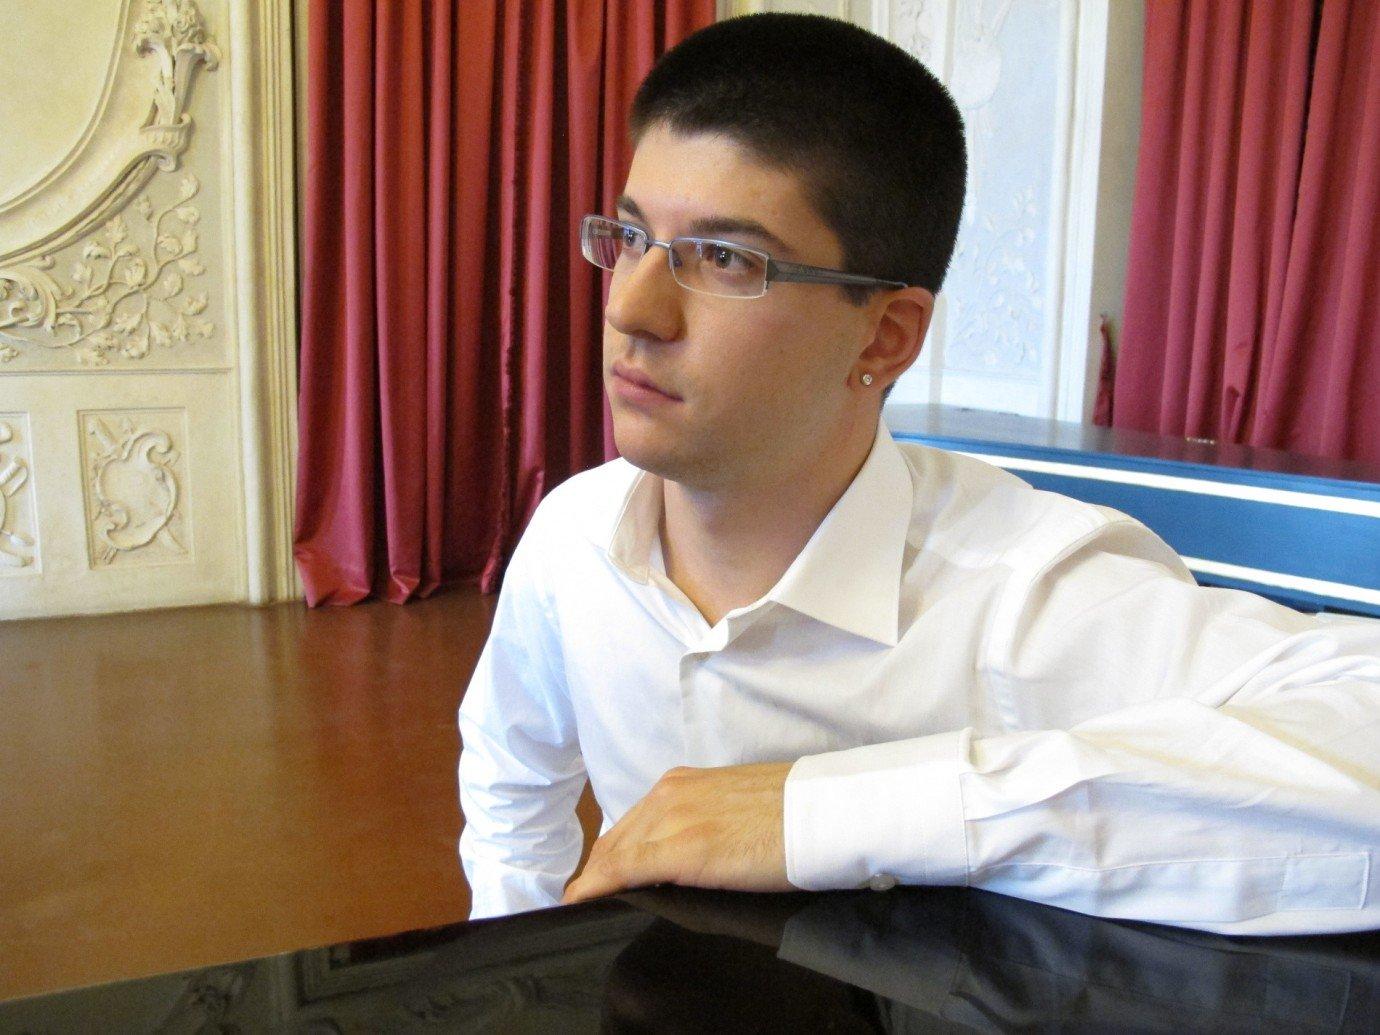 Matteo Biscotti